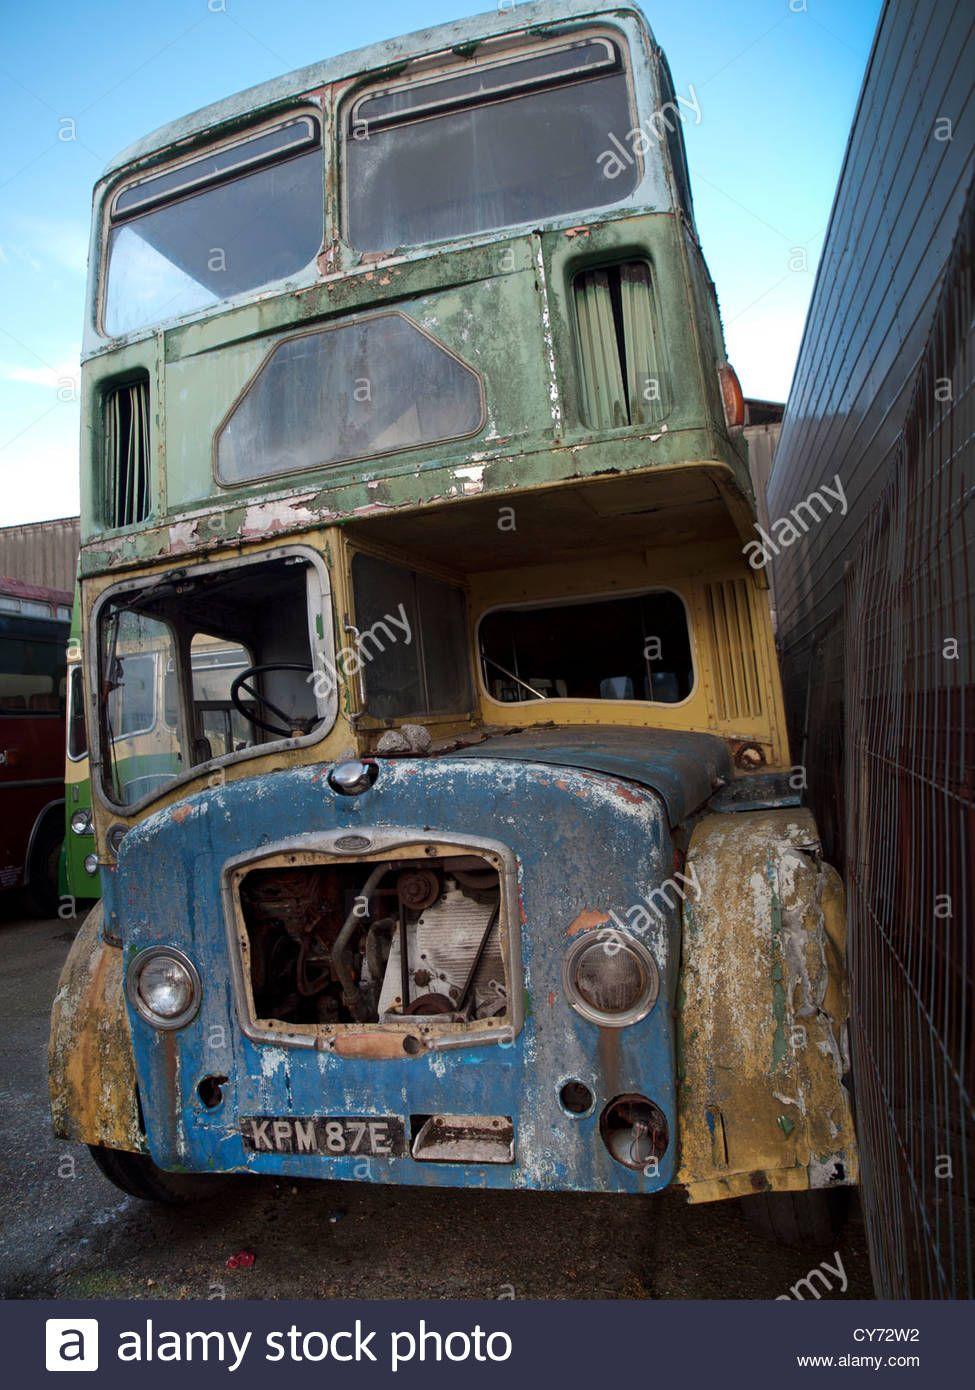 Image result for bus scrap yards | Buses | Pinterest | Vehicle ...